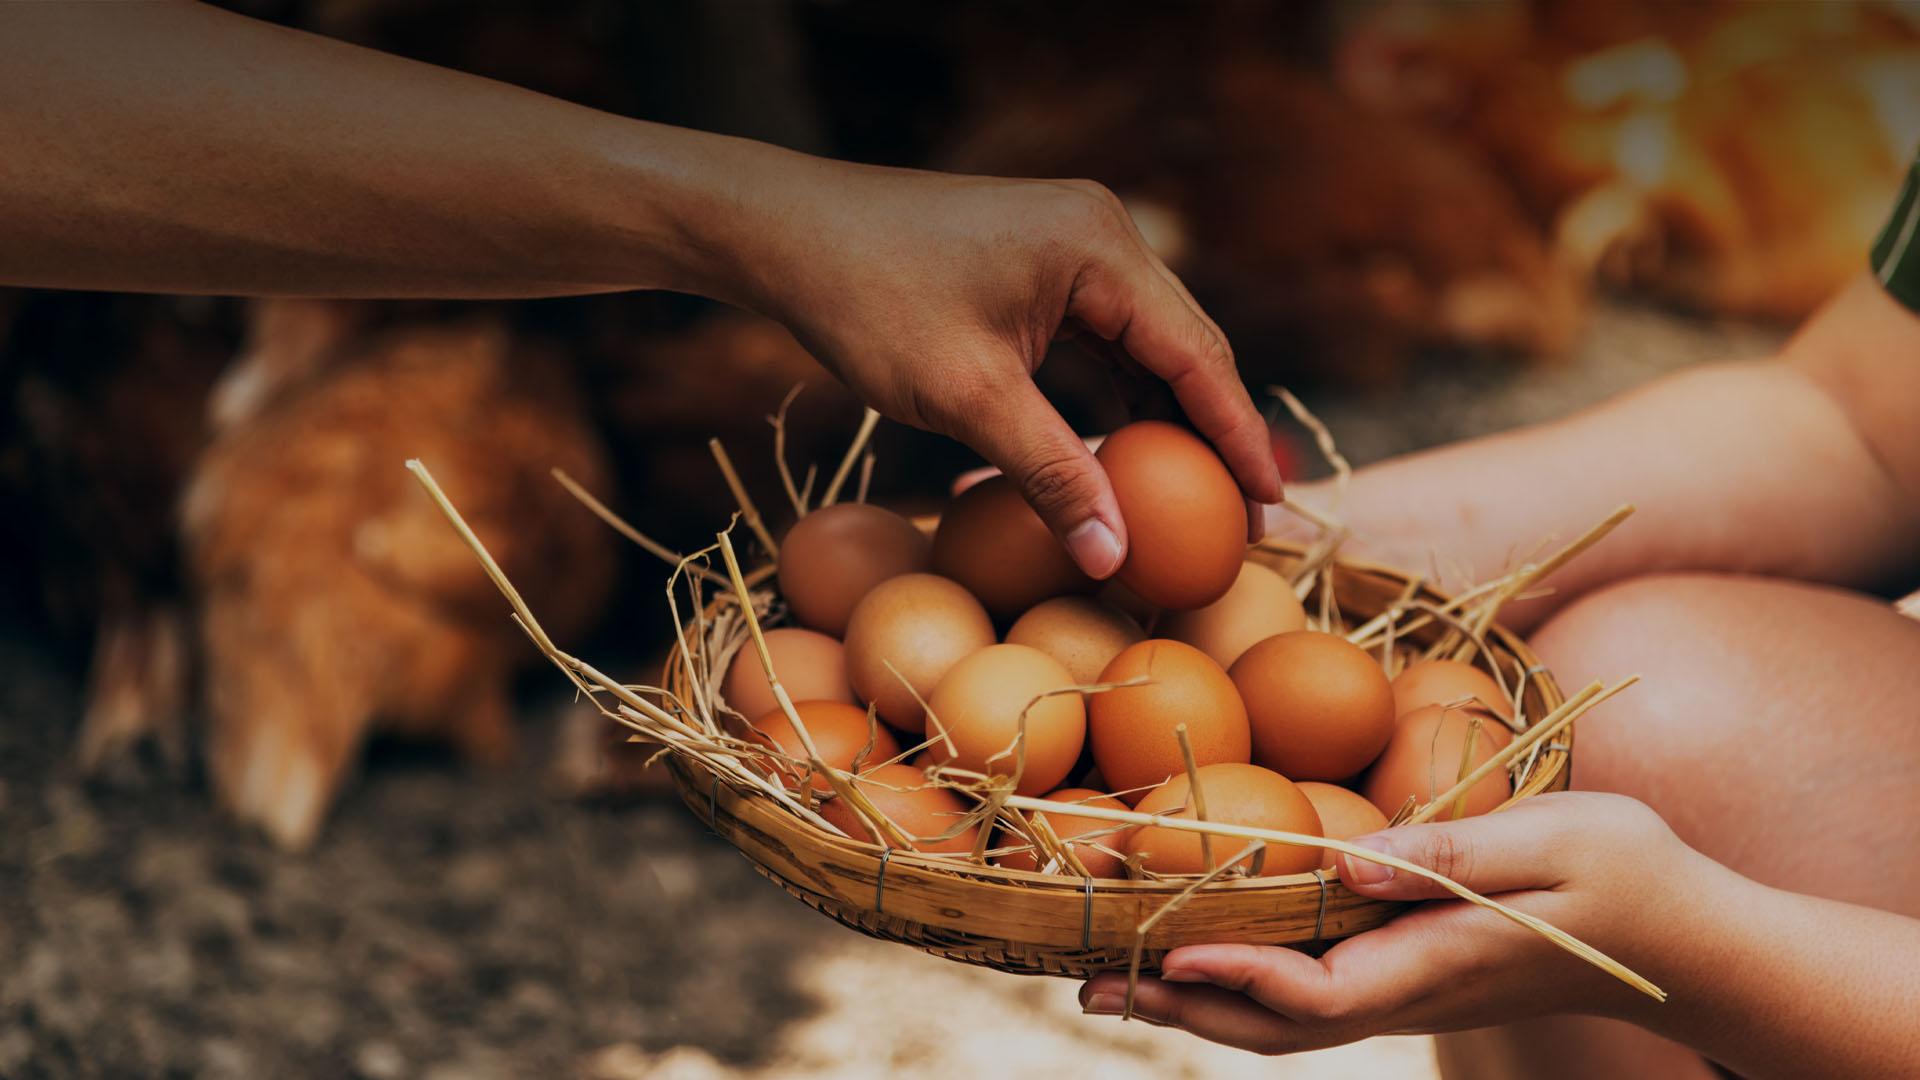 como saber si un huevo es fresco